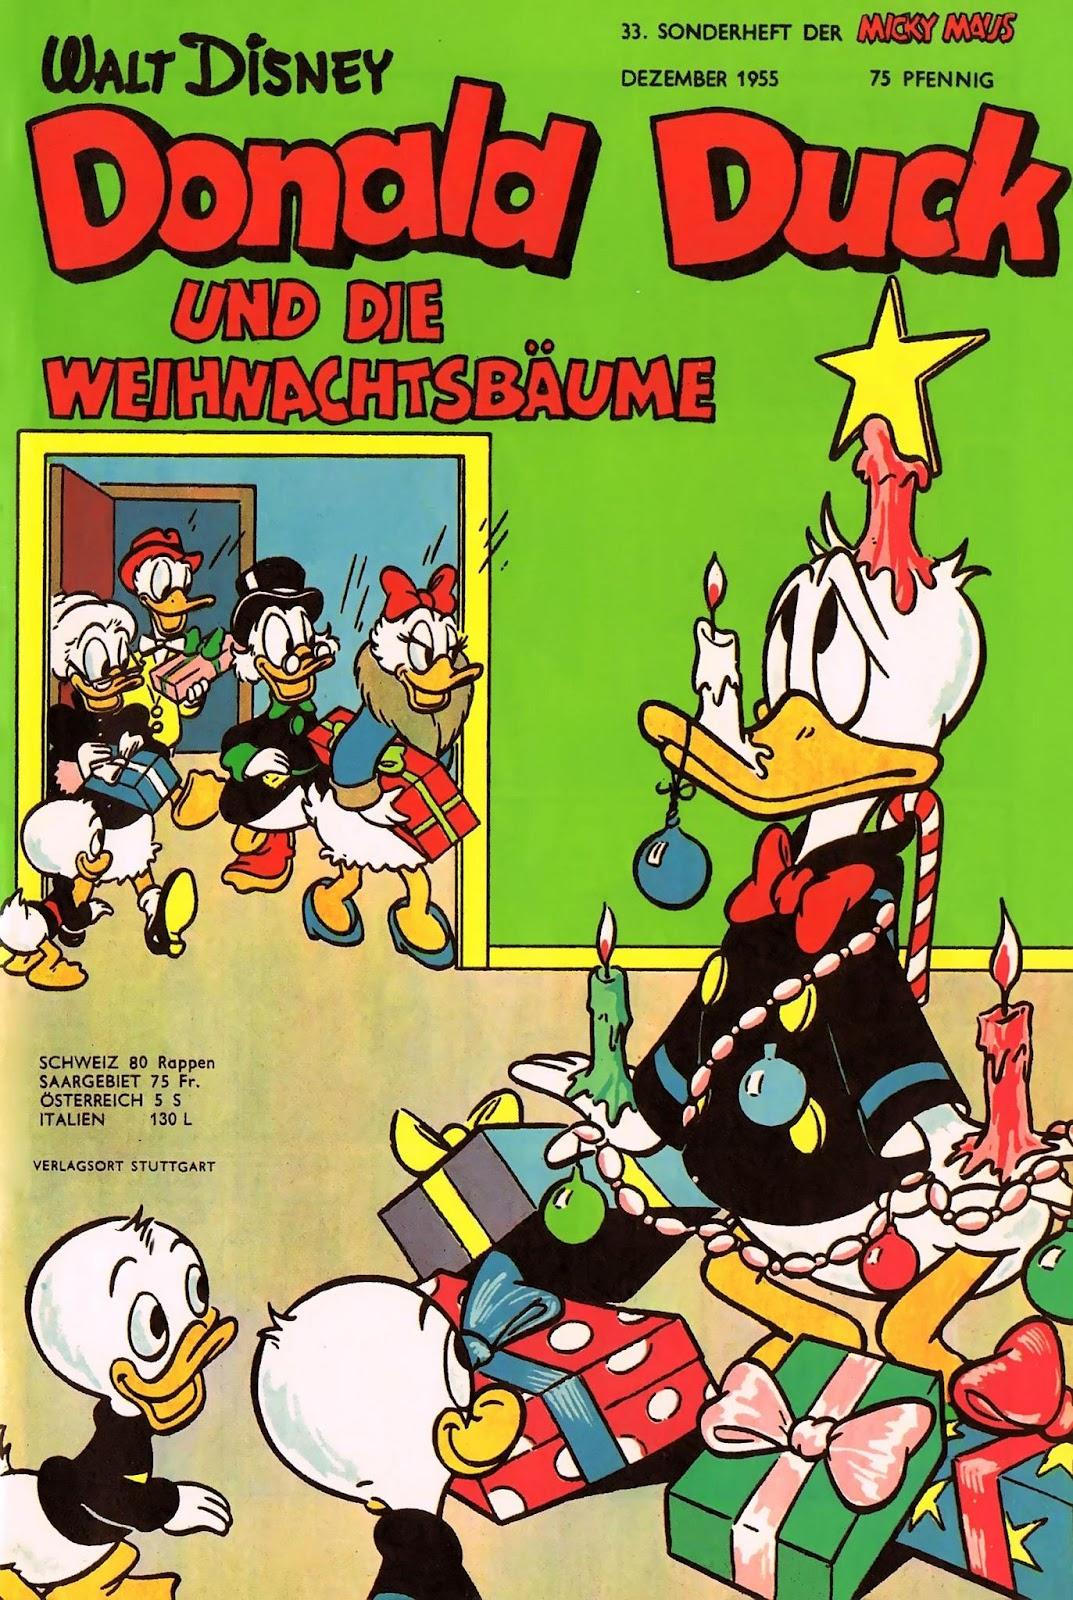 C3 A4ume Sch B6ne Wei Micky Maus Sonderheft 33 Donald Duck Und Weihnachtsbäume Ehapa Verlag Comix Load 1951 Komplett